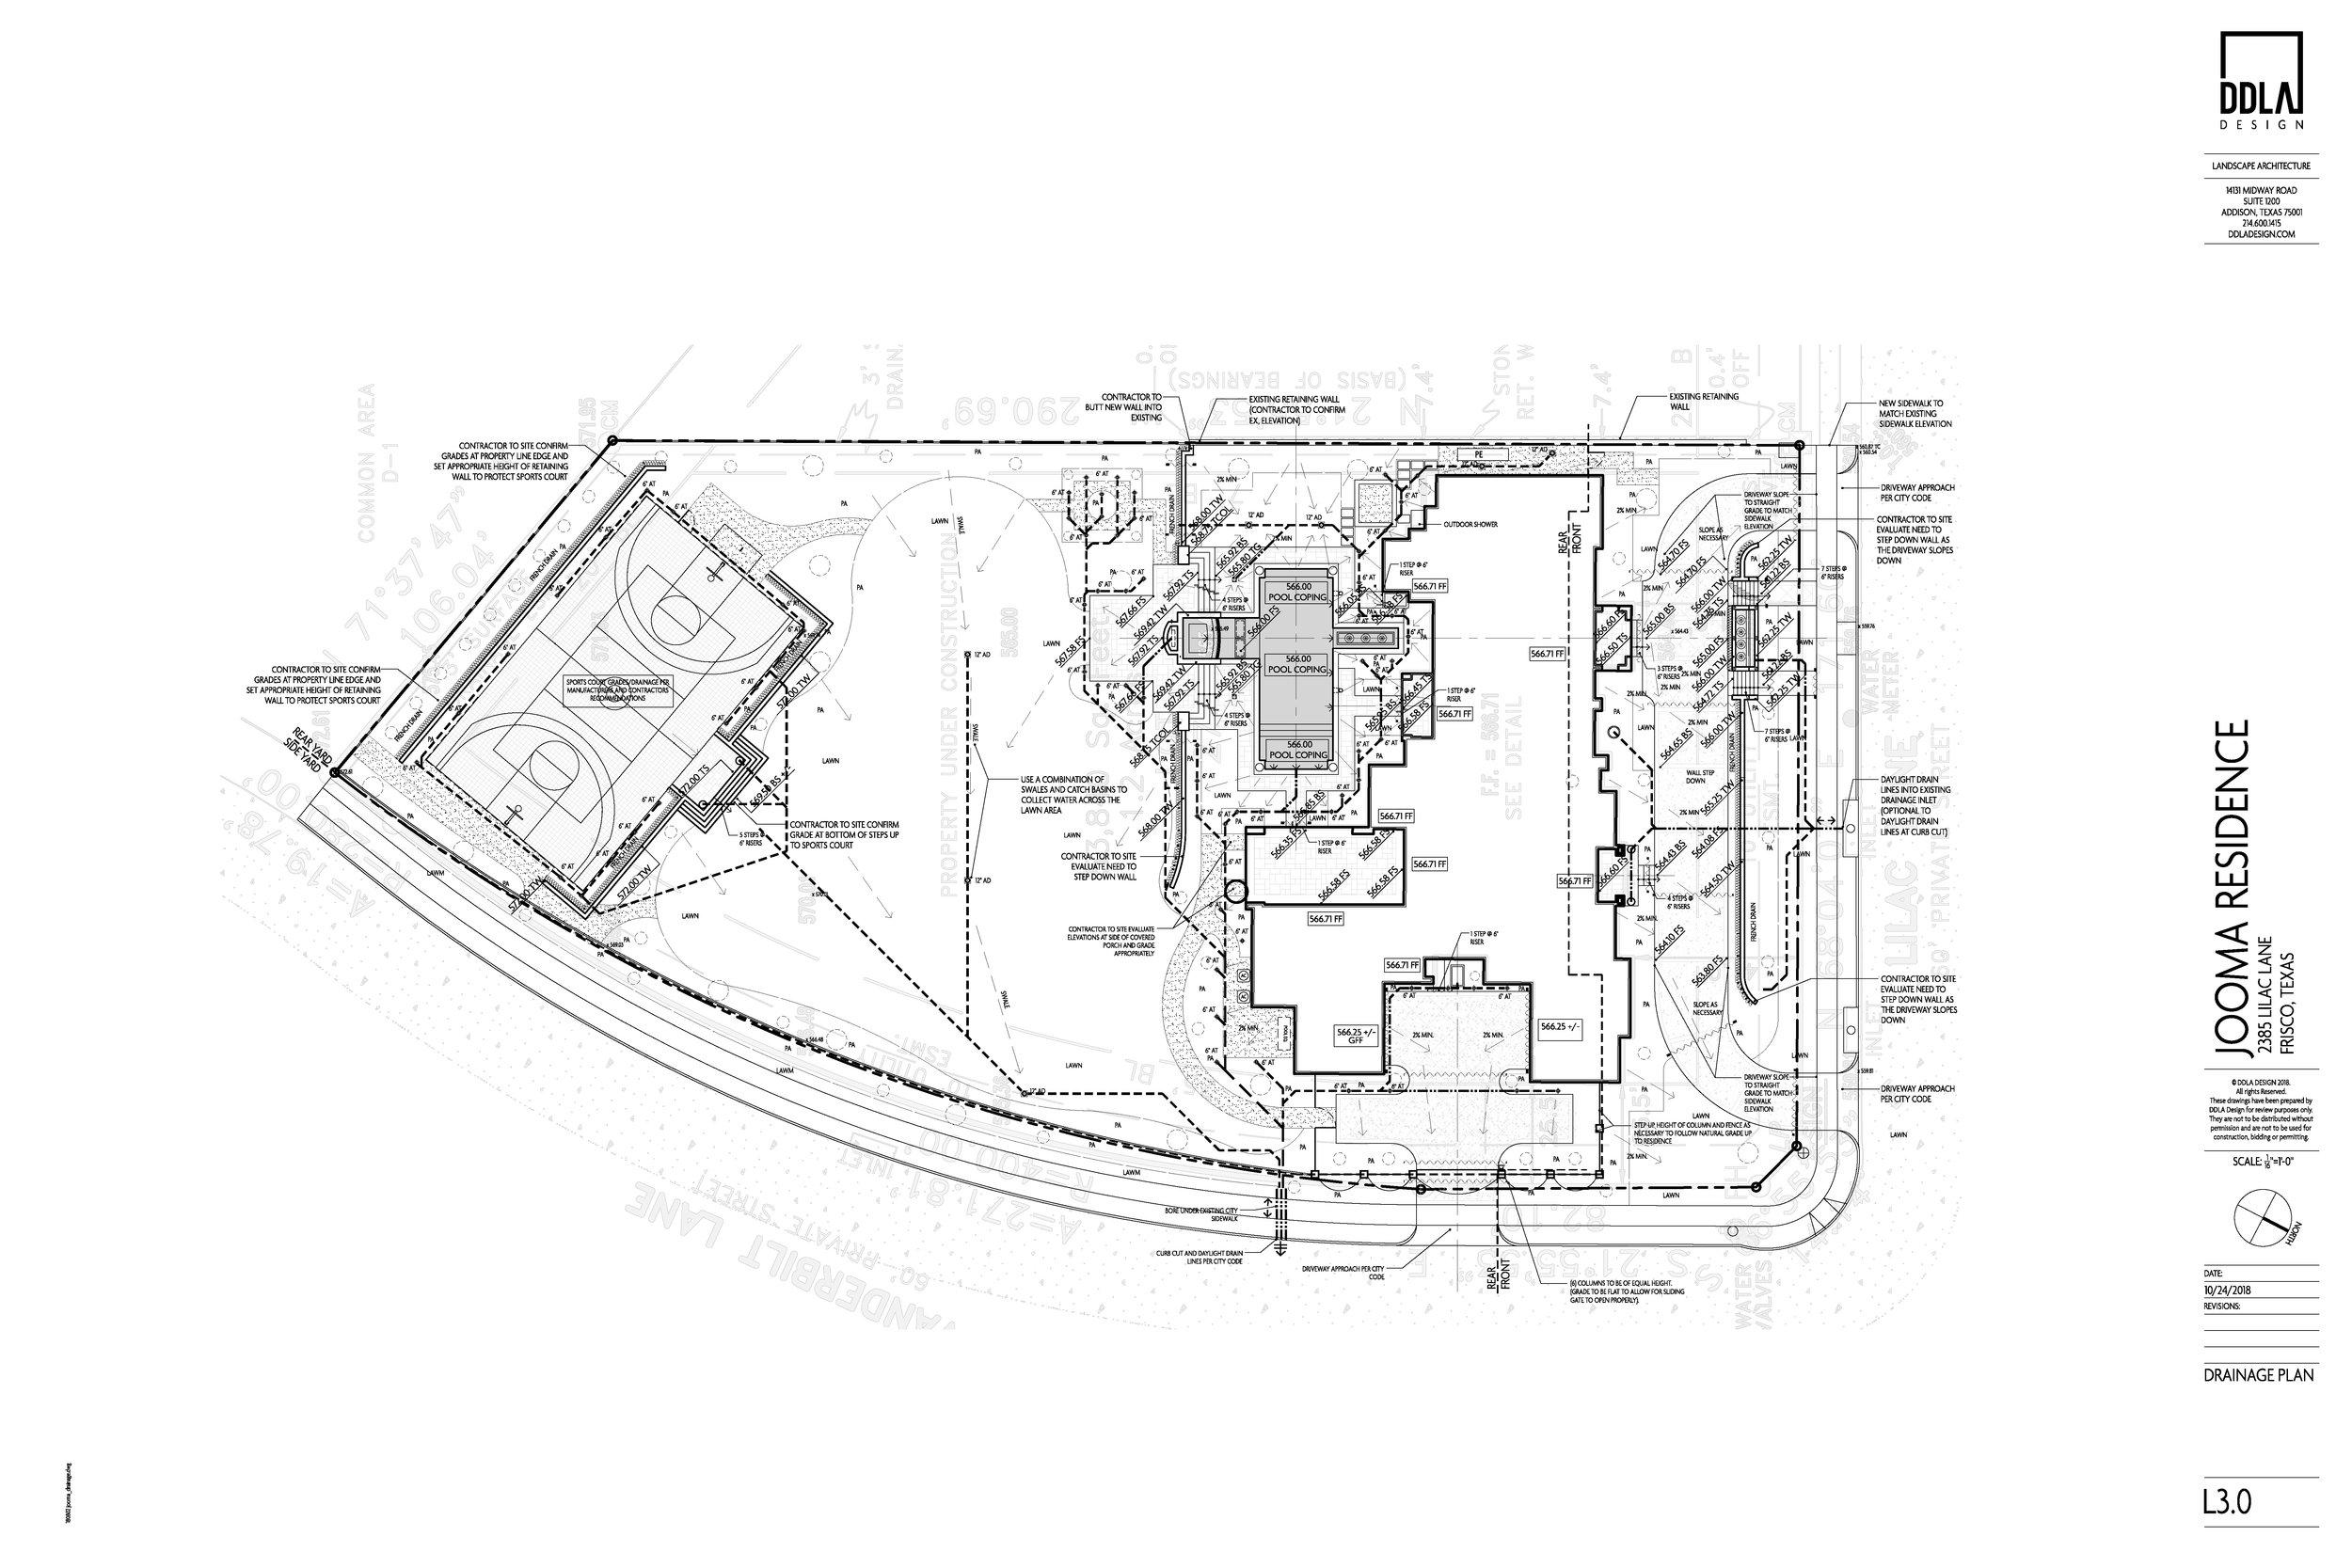 181211 jooma_final drawing package (owner)_Page_08.jpg